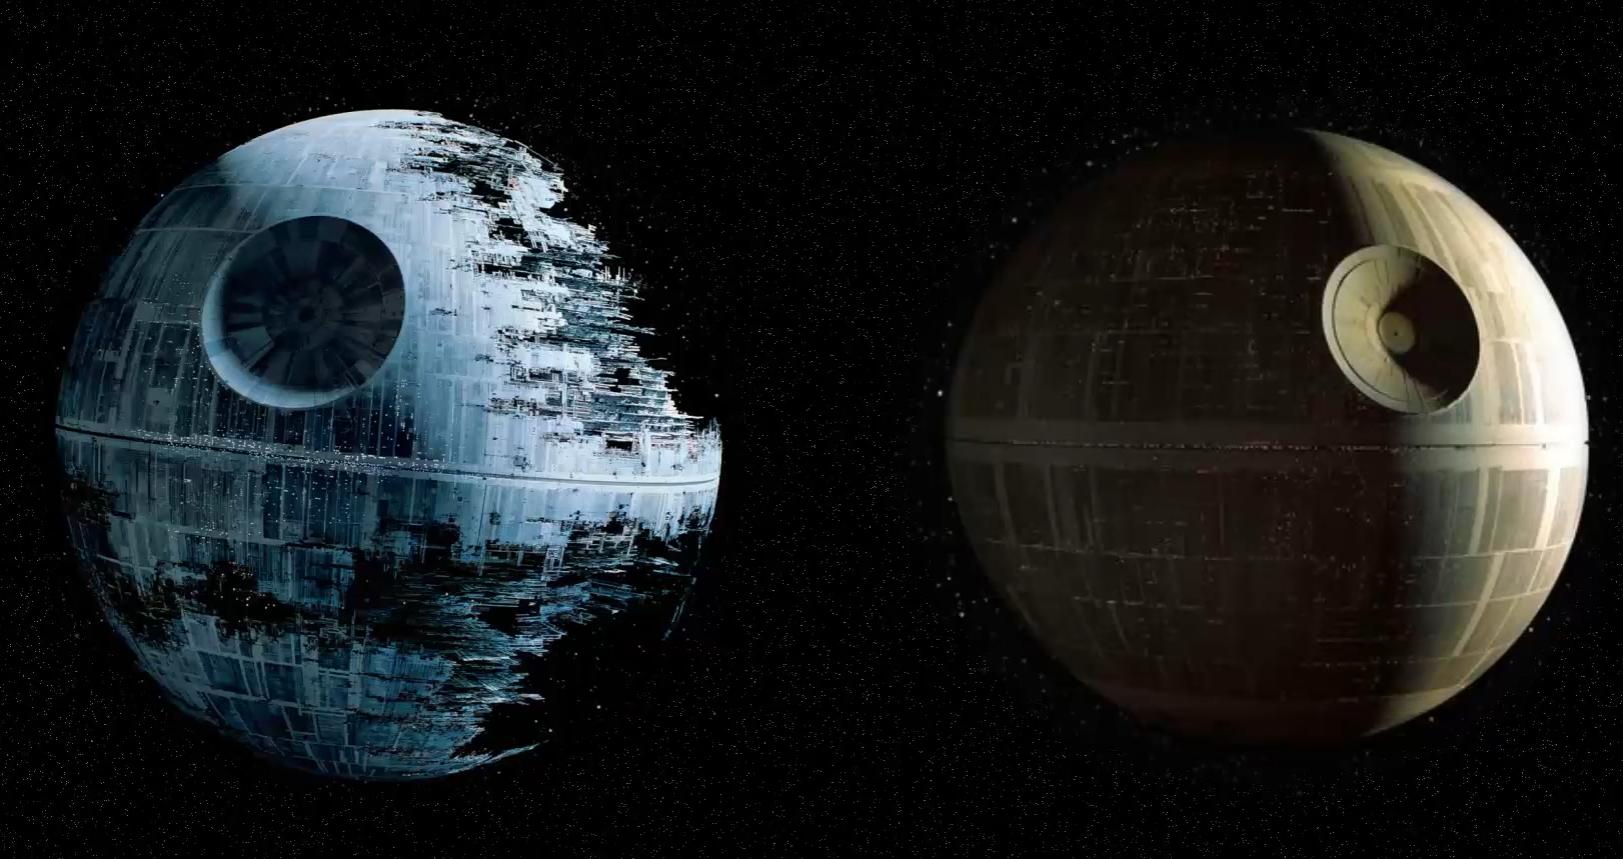 Hviezda smrti - Hviezdne vojny | Star Wars